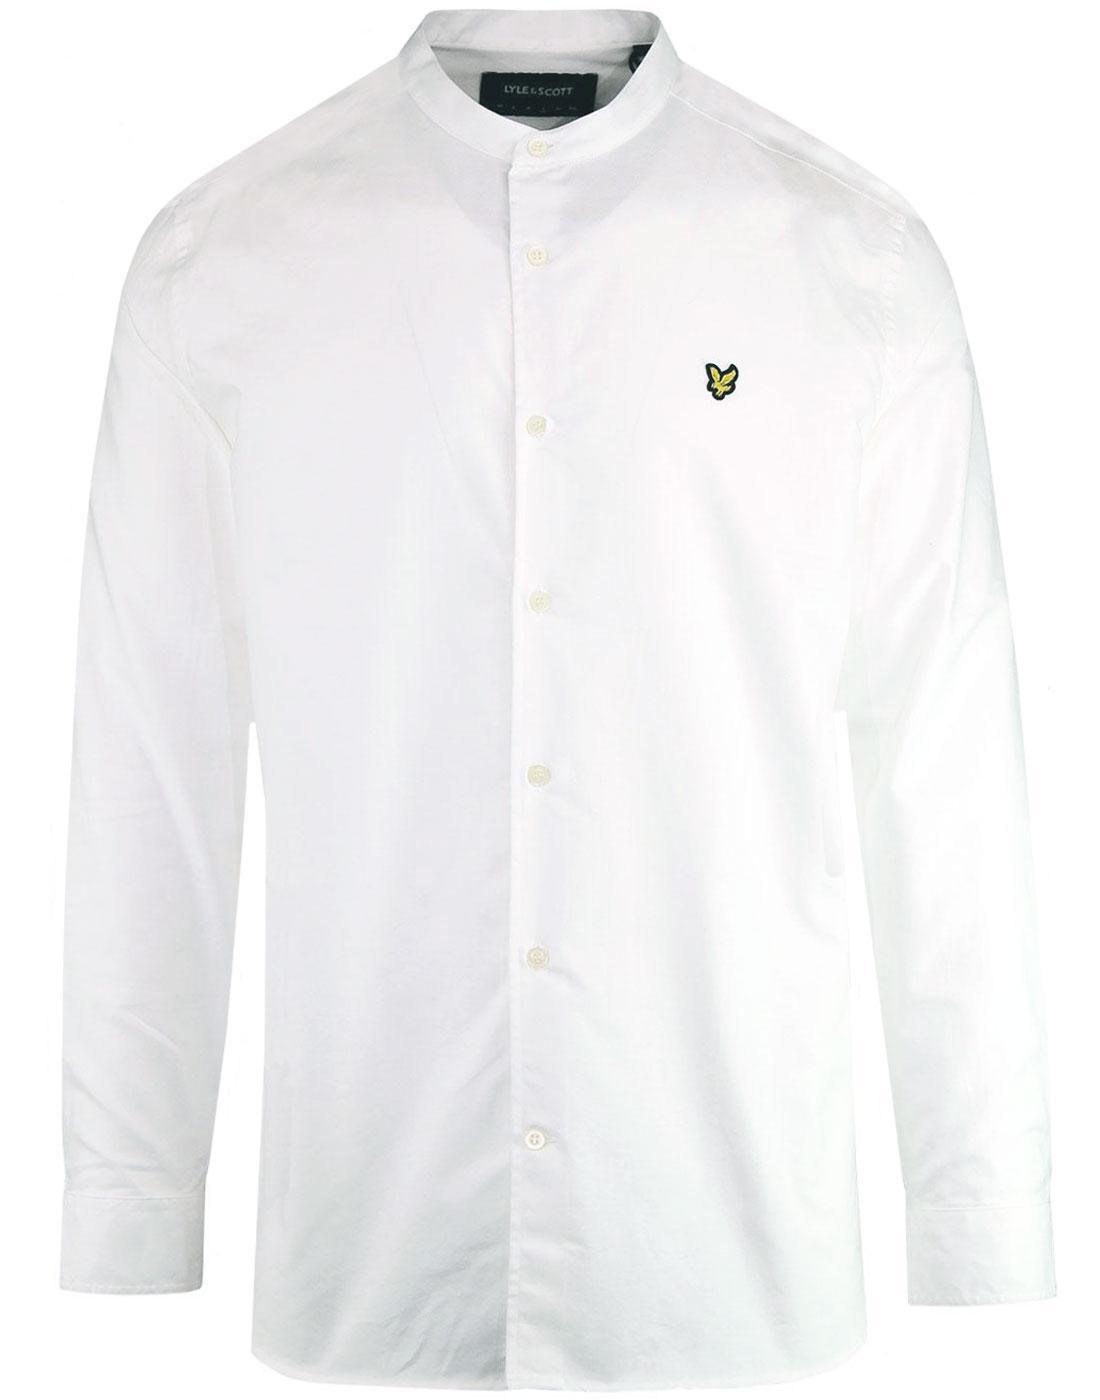 LYLE & SCOTT 60s Mod Grandad Collar Oxford Shirt W